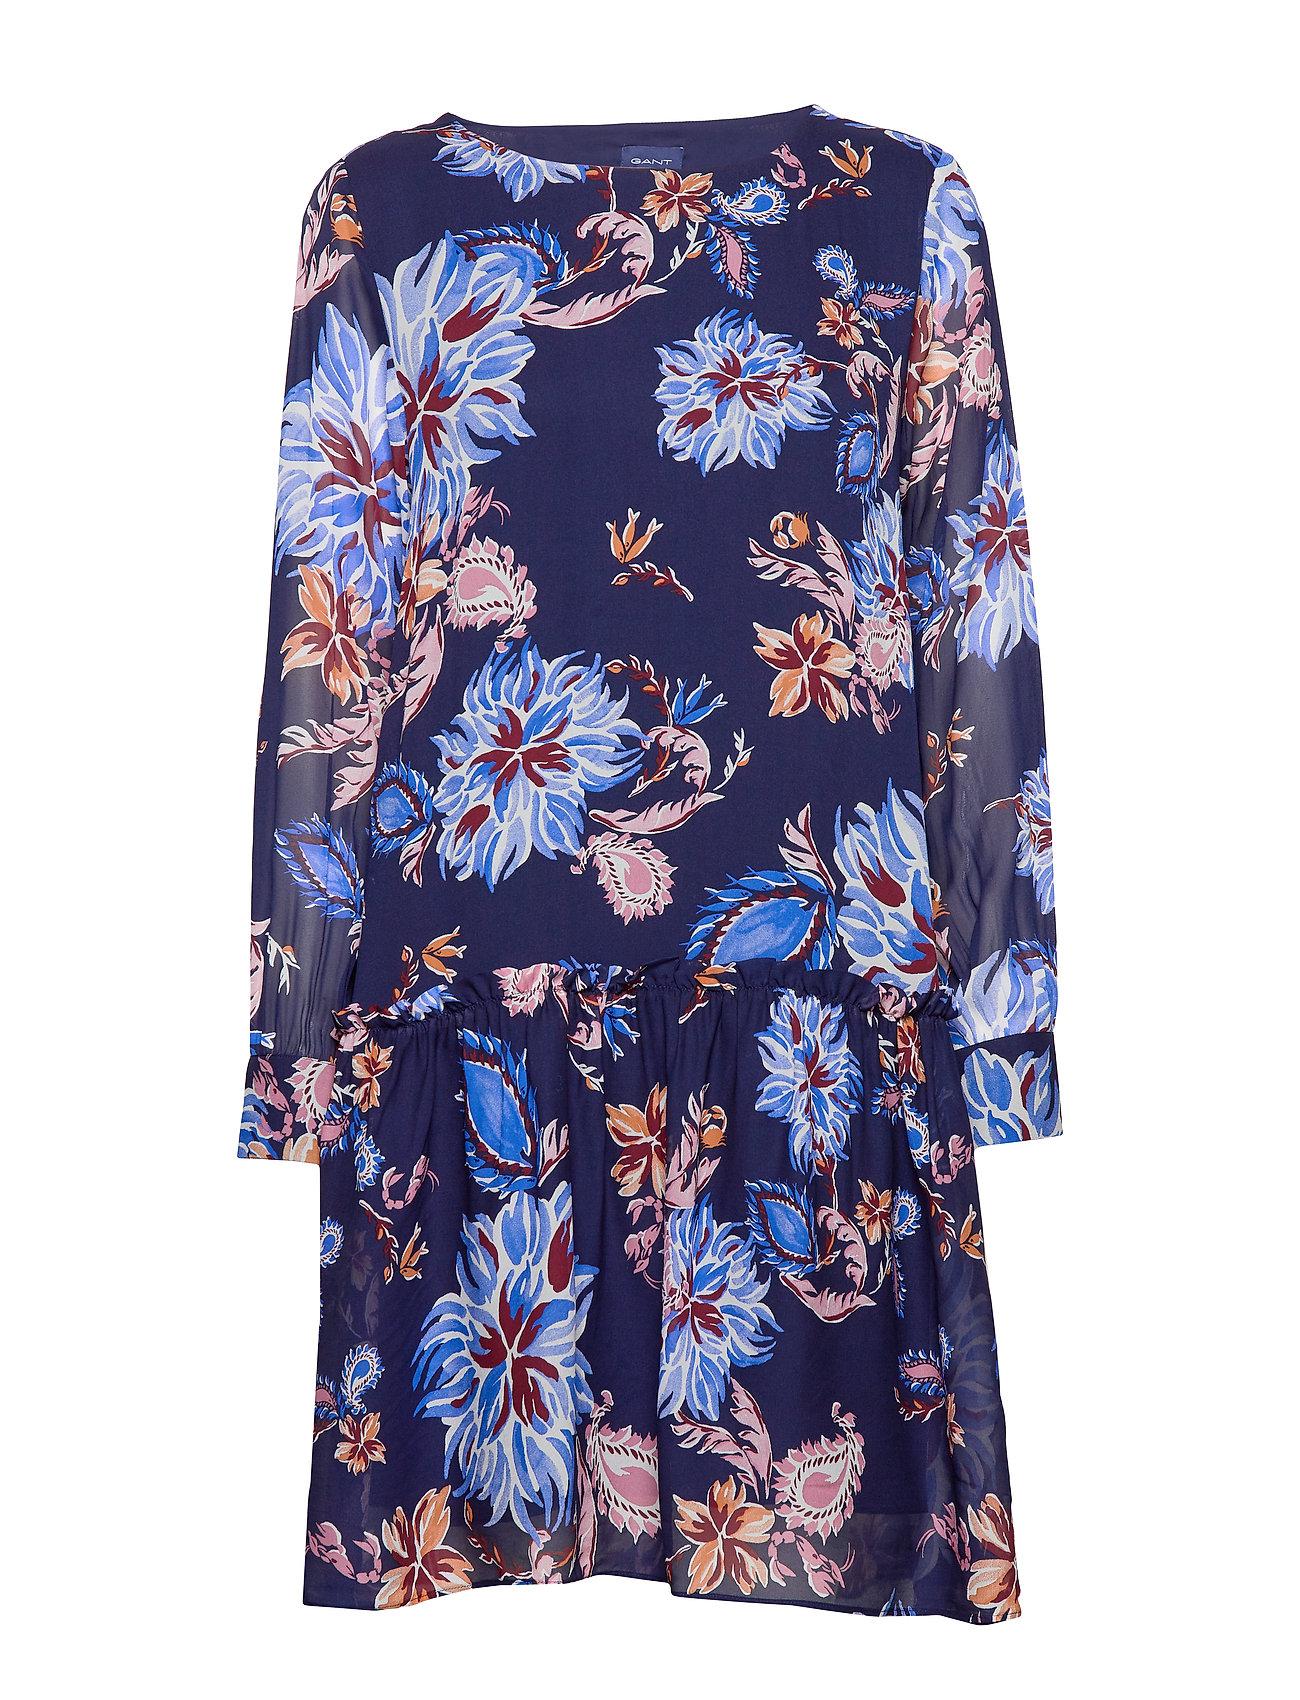 Gant D1. MARINE PAISLEY CHIFFON DRESS - PERSIAN BLUE